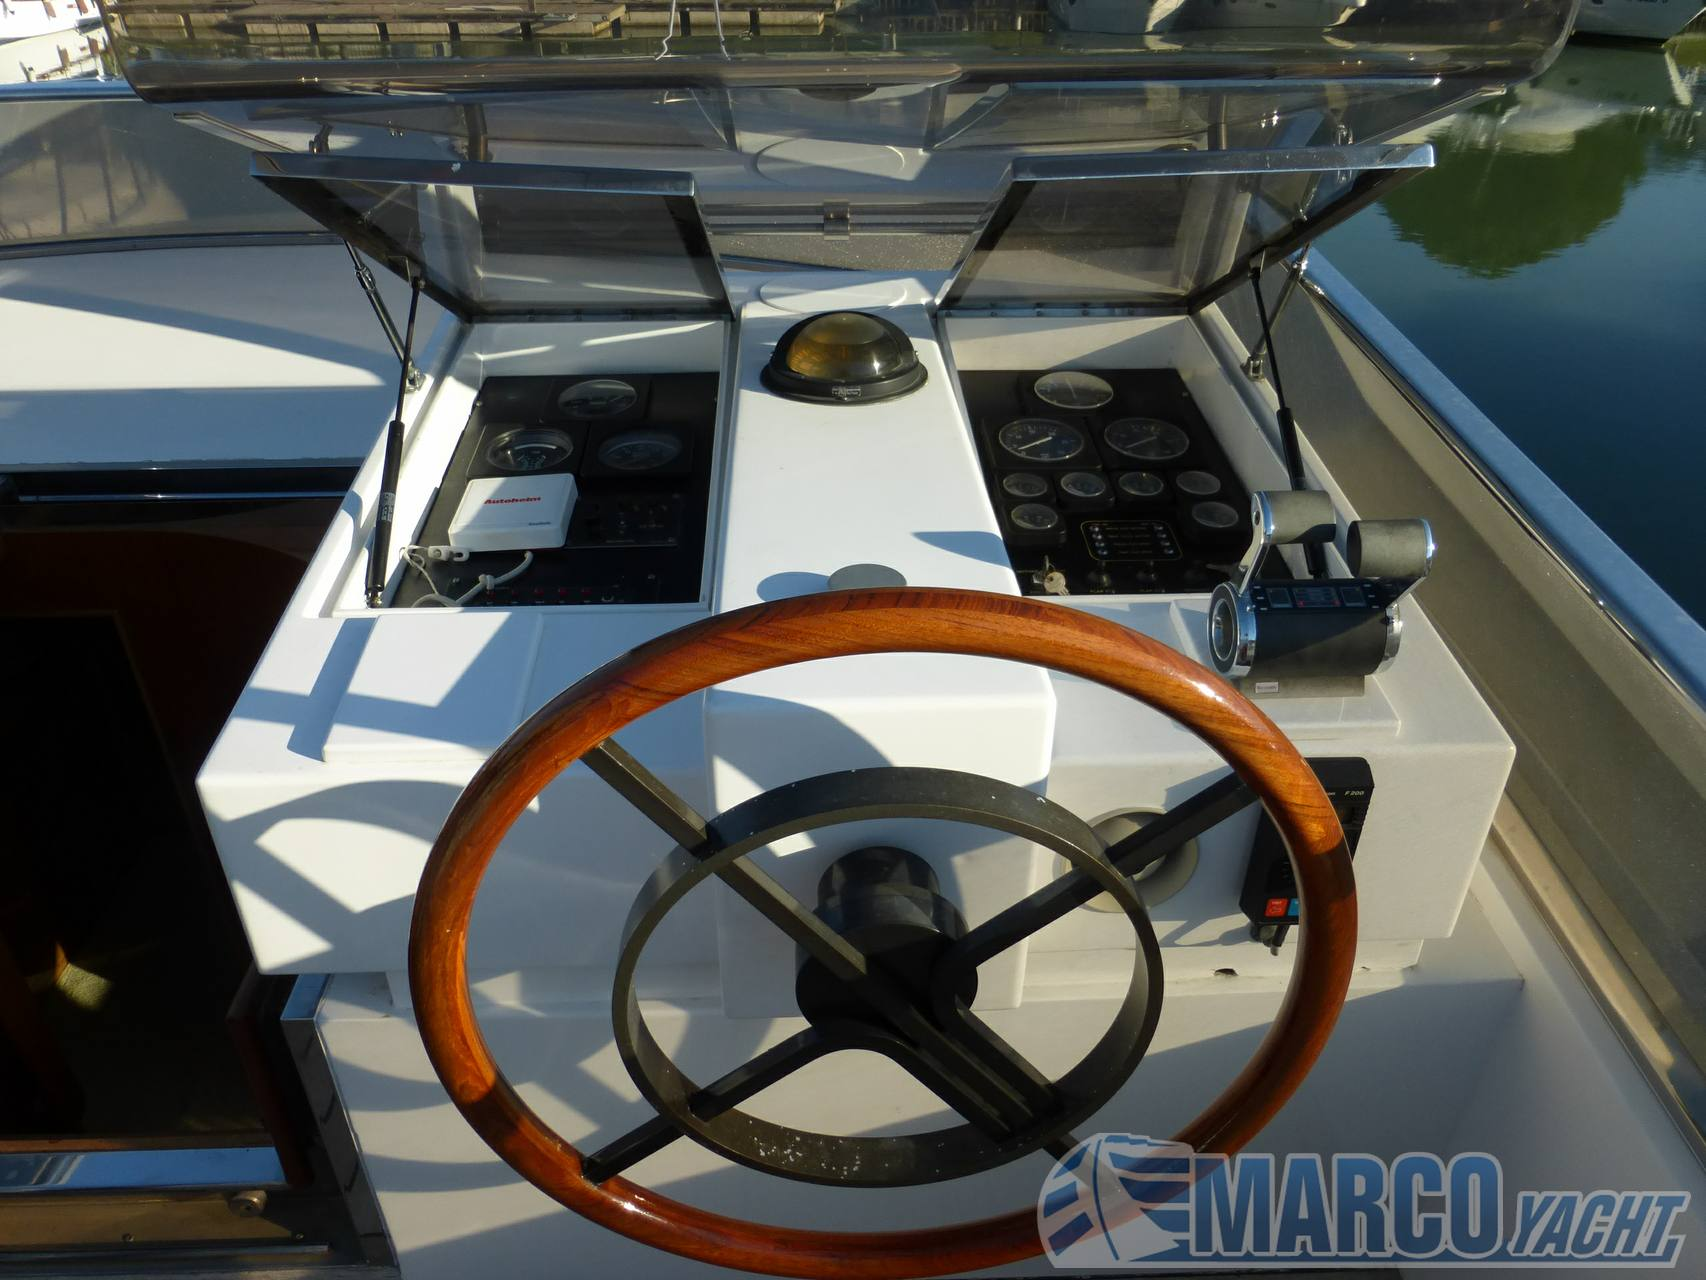 Cantieri navali liguri Ghibli - charter Motor boat charter